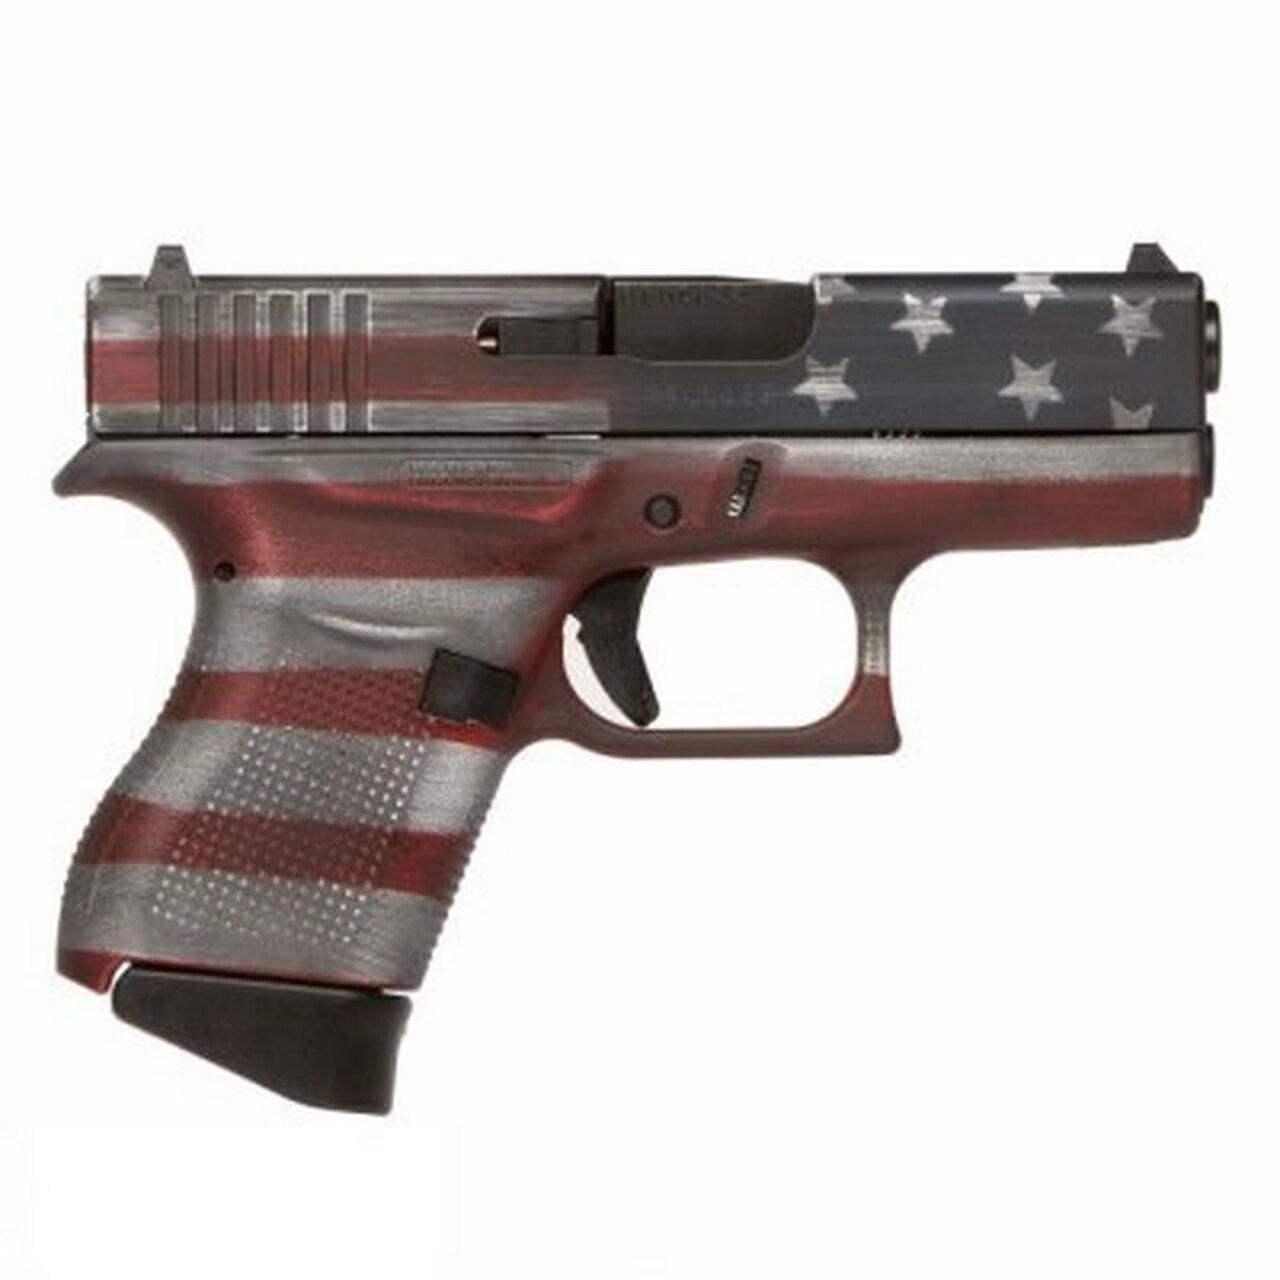 "Image of Glock G43 Subcompact, 9mm, 3.39"" Barrel, 6rd, American Flag"